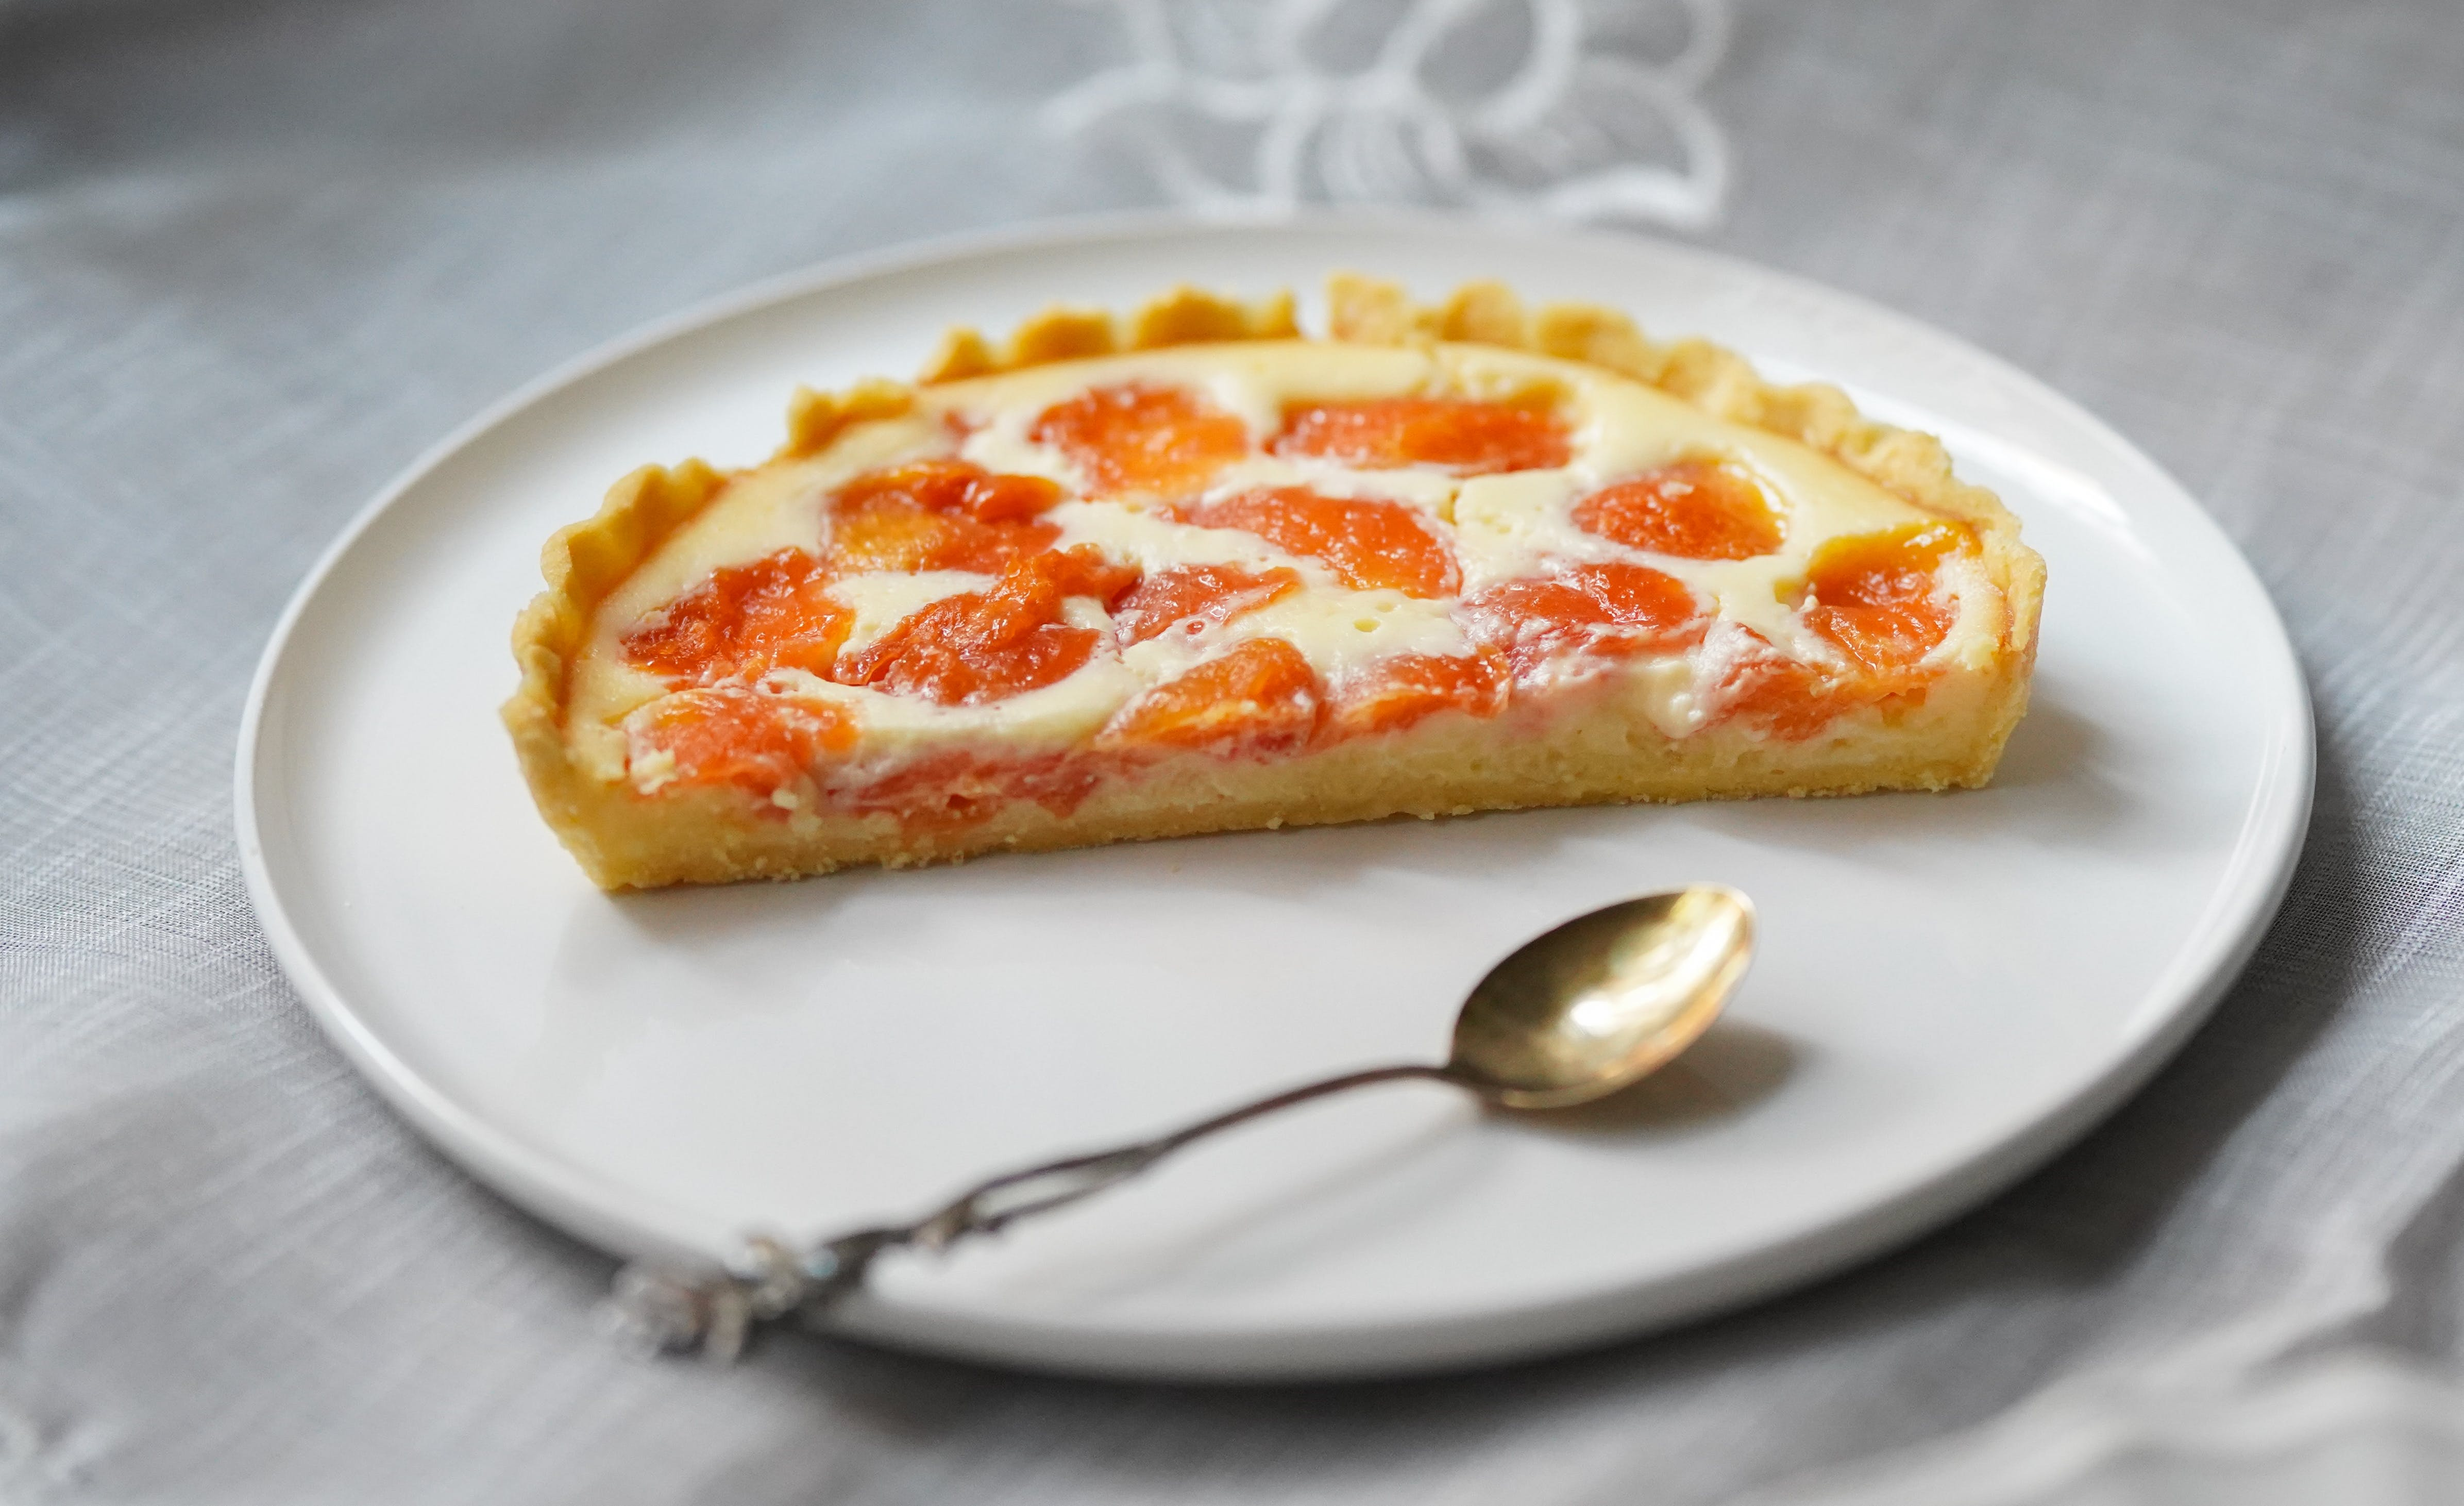 Baked Pie on Ceramic Plate